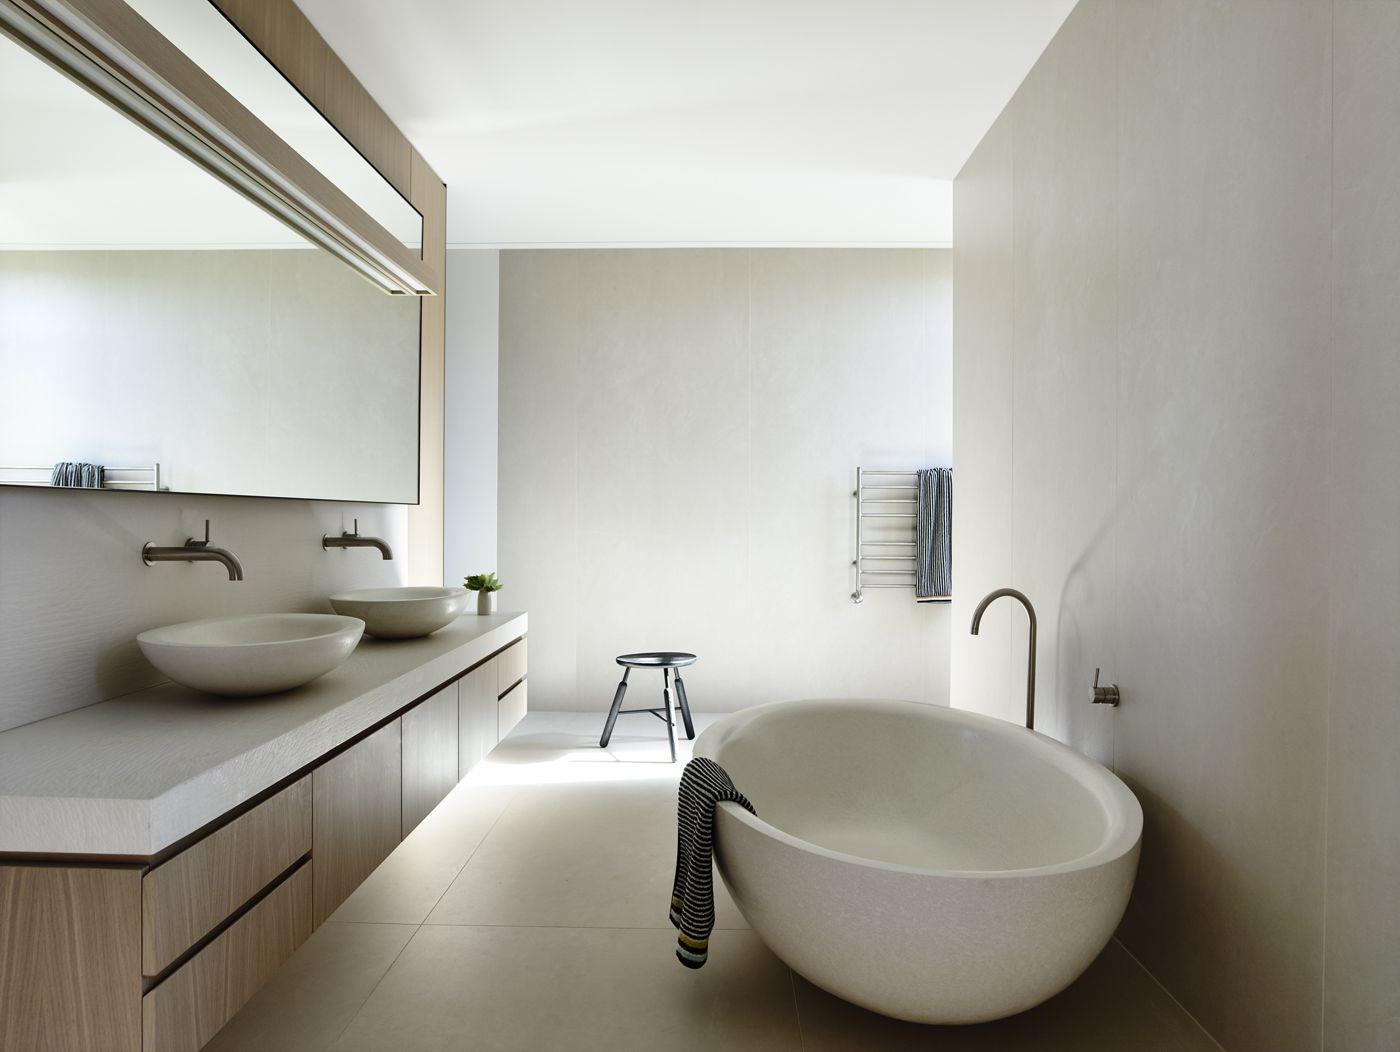 Limed oak veneer concrete bath and basins